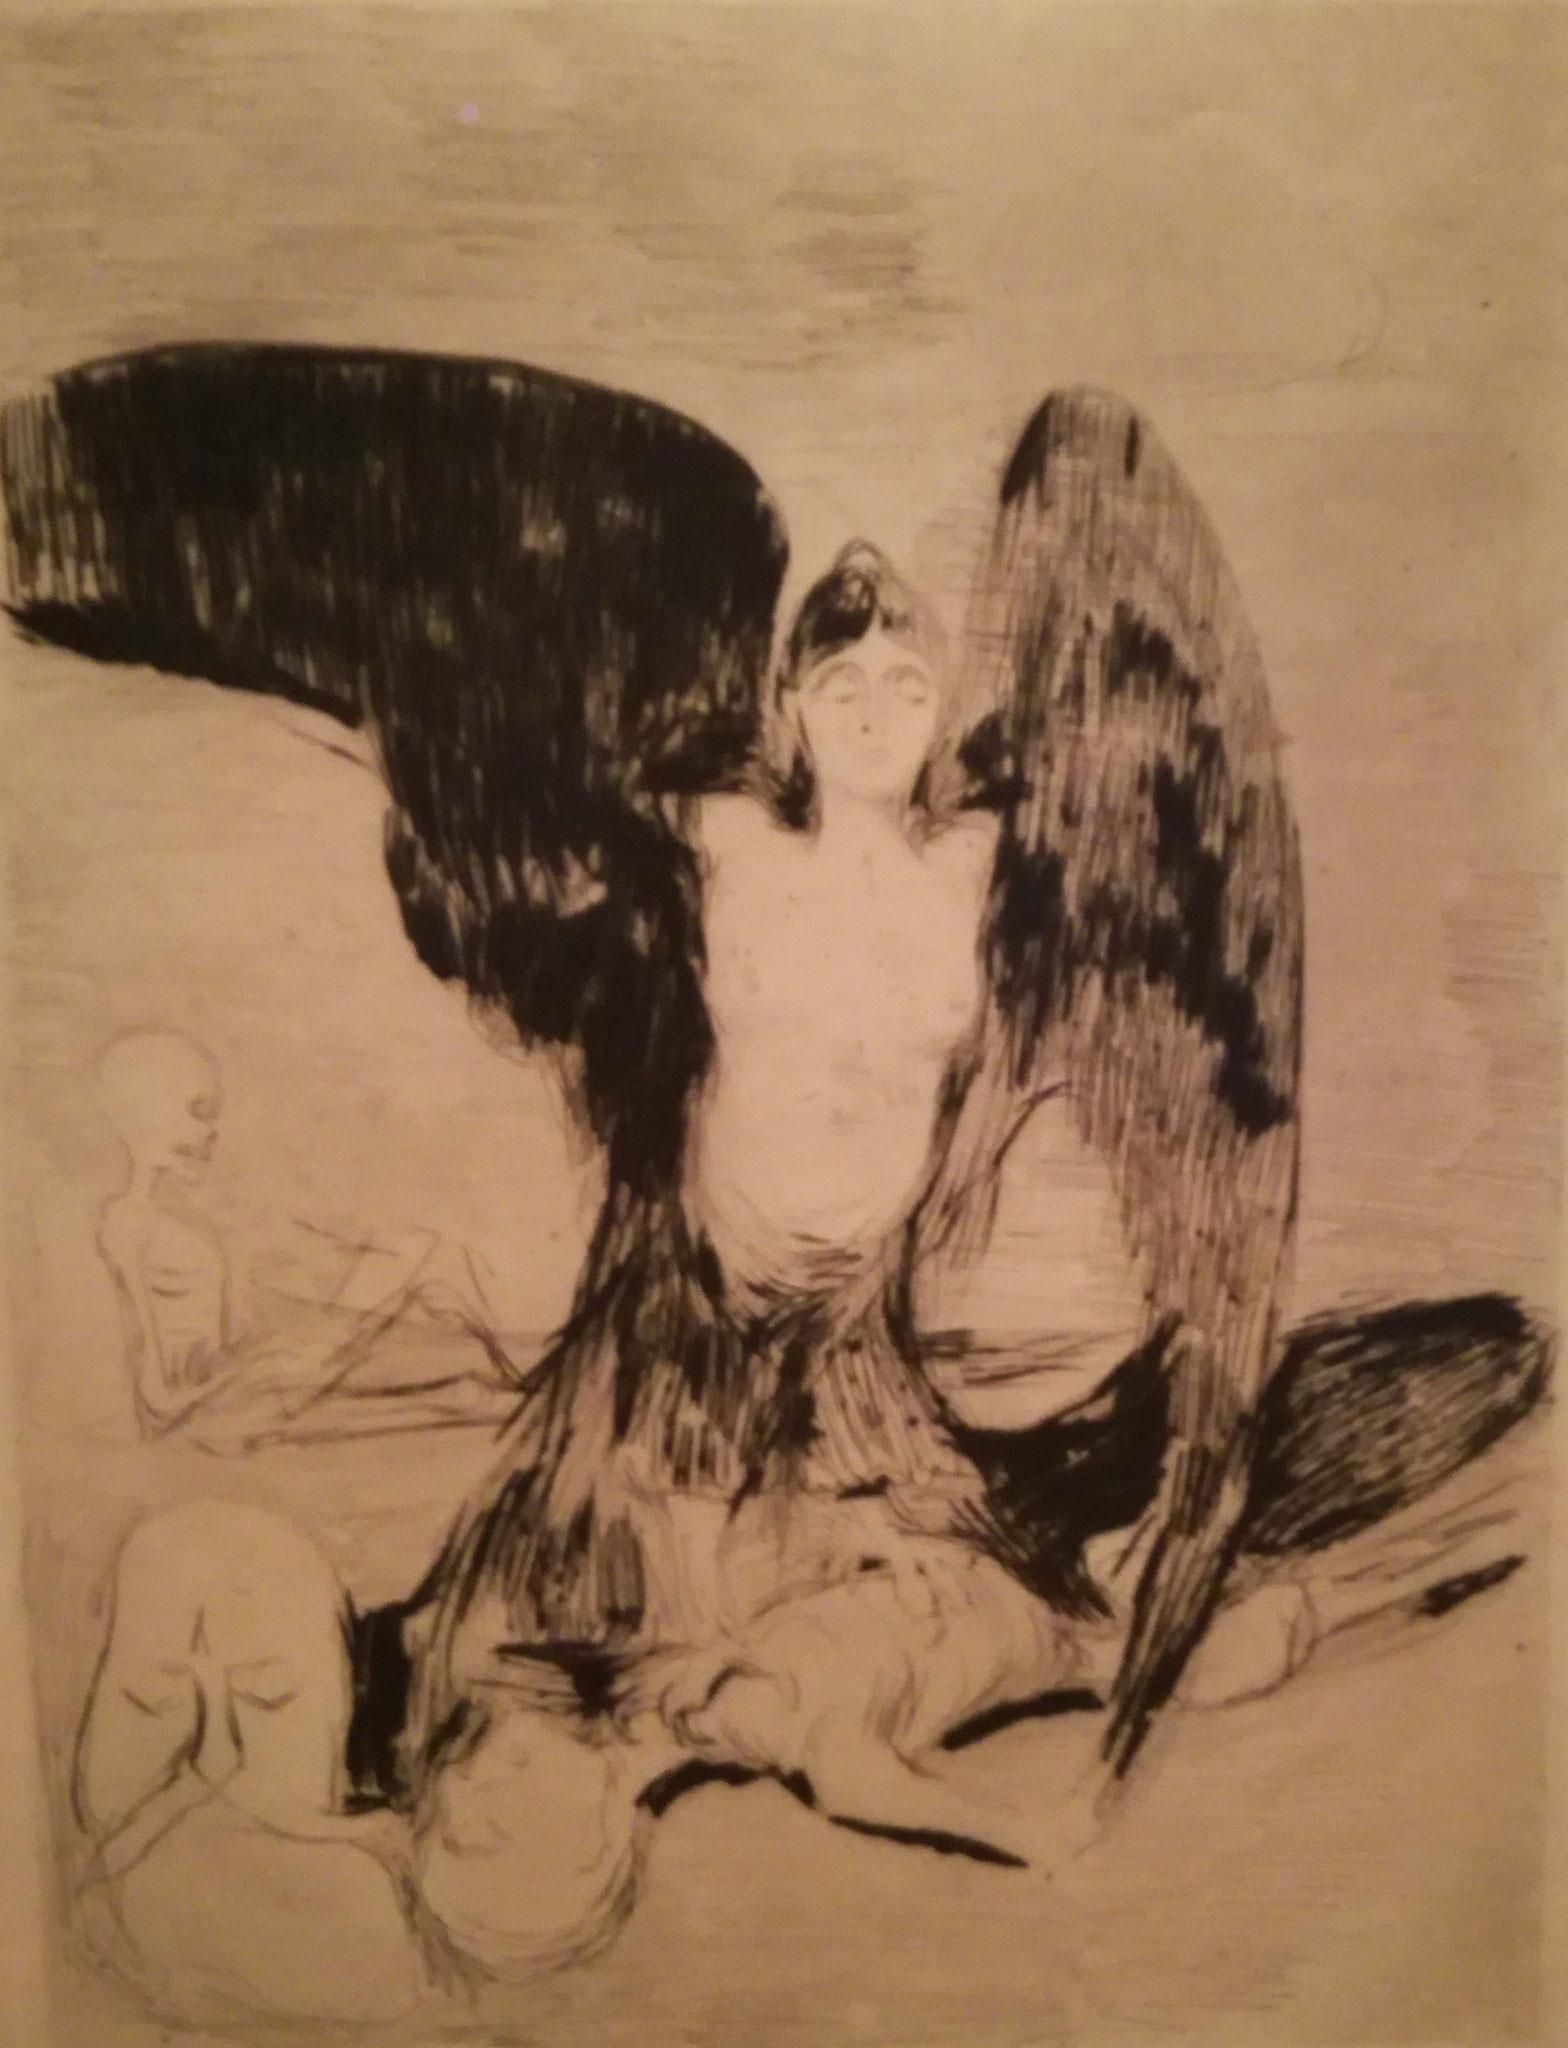 Edvard Munch, Sammlung Scharf-Gerstenberg, Nationalgalerie Berlin